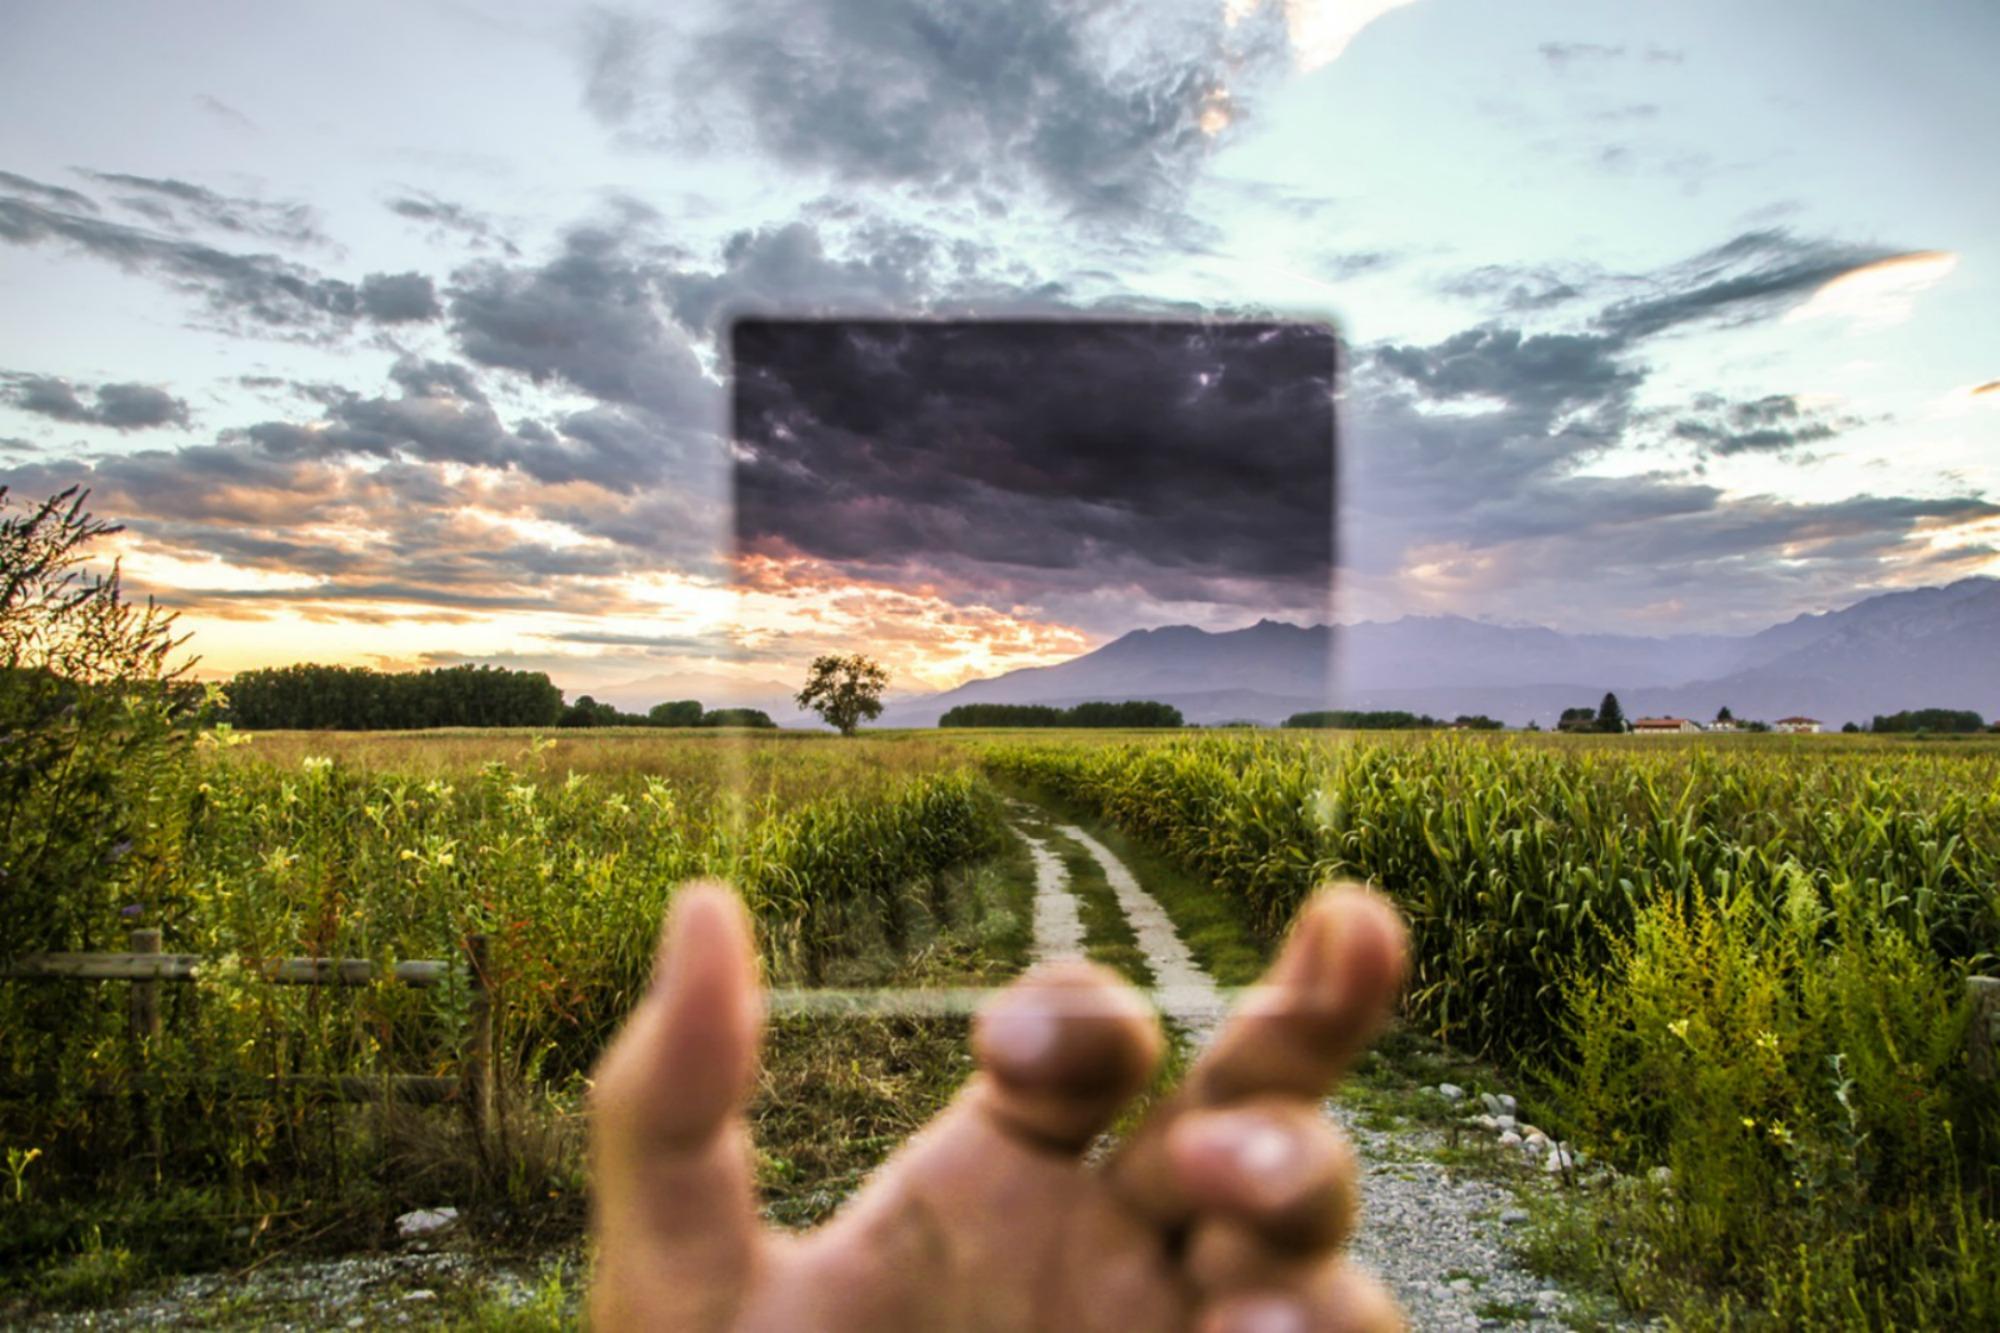 landscape-nature-hand-field